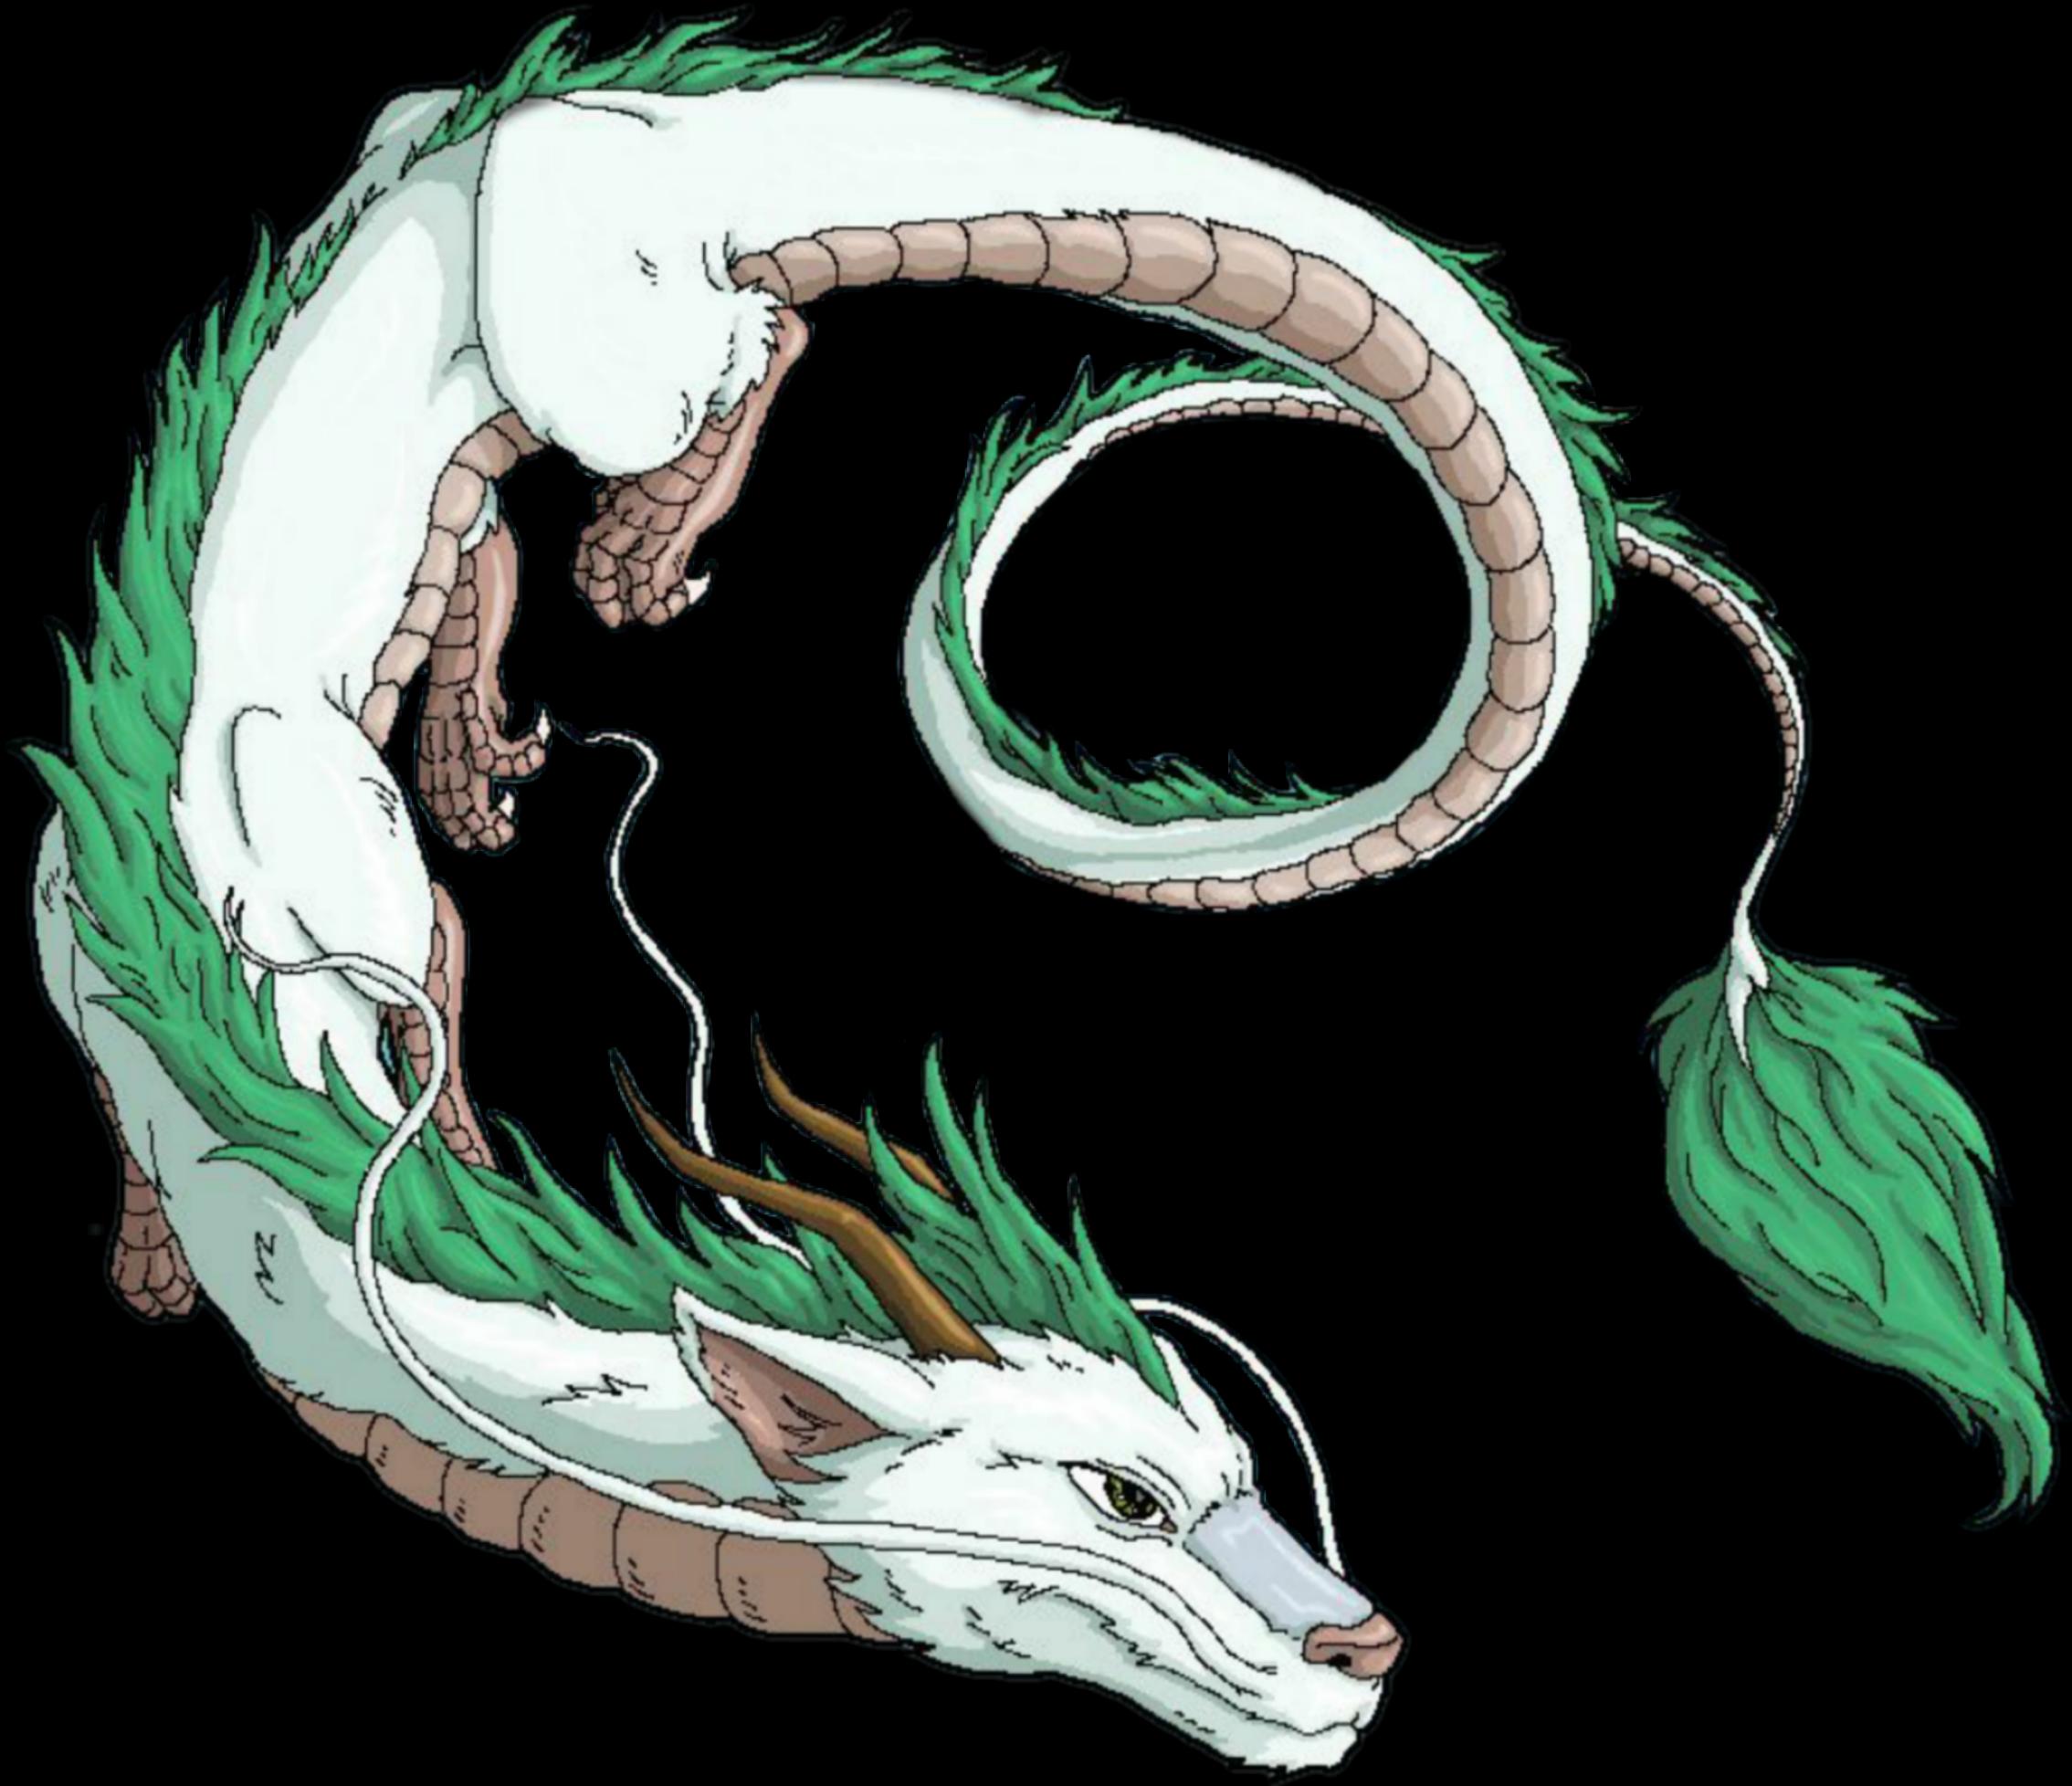 Freetoedit Haku Chihiro Japanese Dragons Pelicula Enojado Volando Remixit In 2020 Dragon Drawing Japanese Dragon Drawing Dragon Art